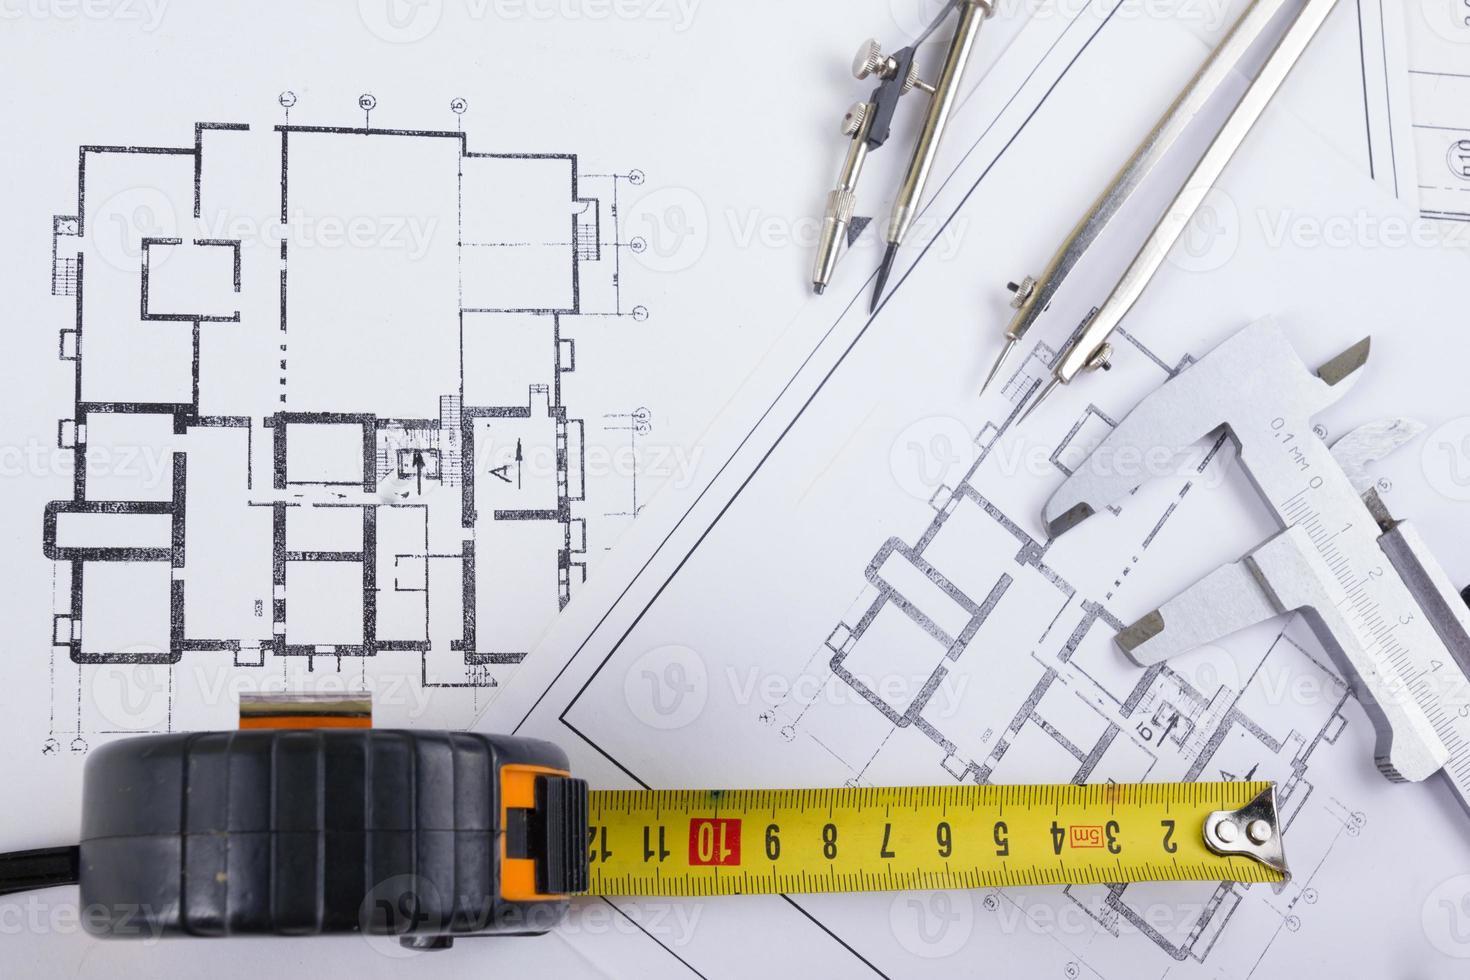 proyecto arquitectónico, planos, compás divisor, pinzas, lápiz, calculadora en planos foto